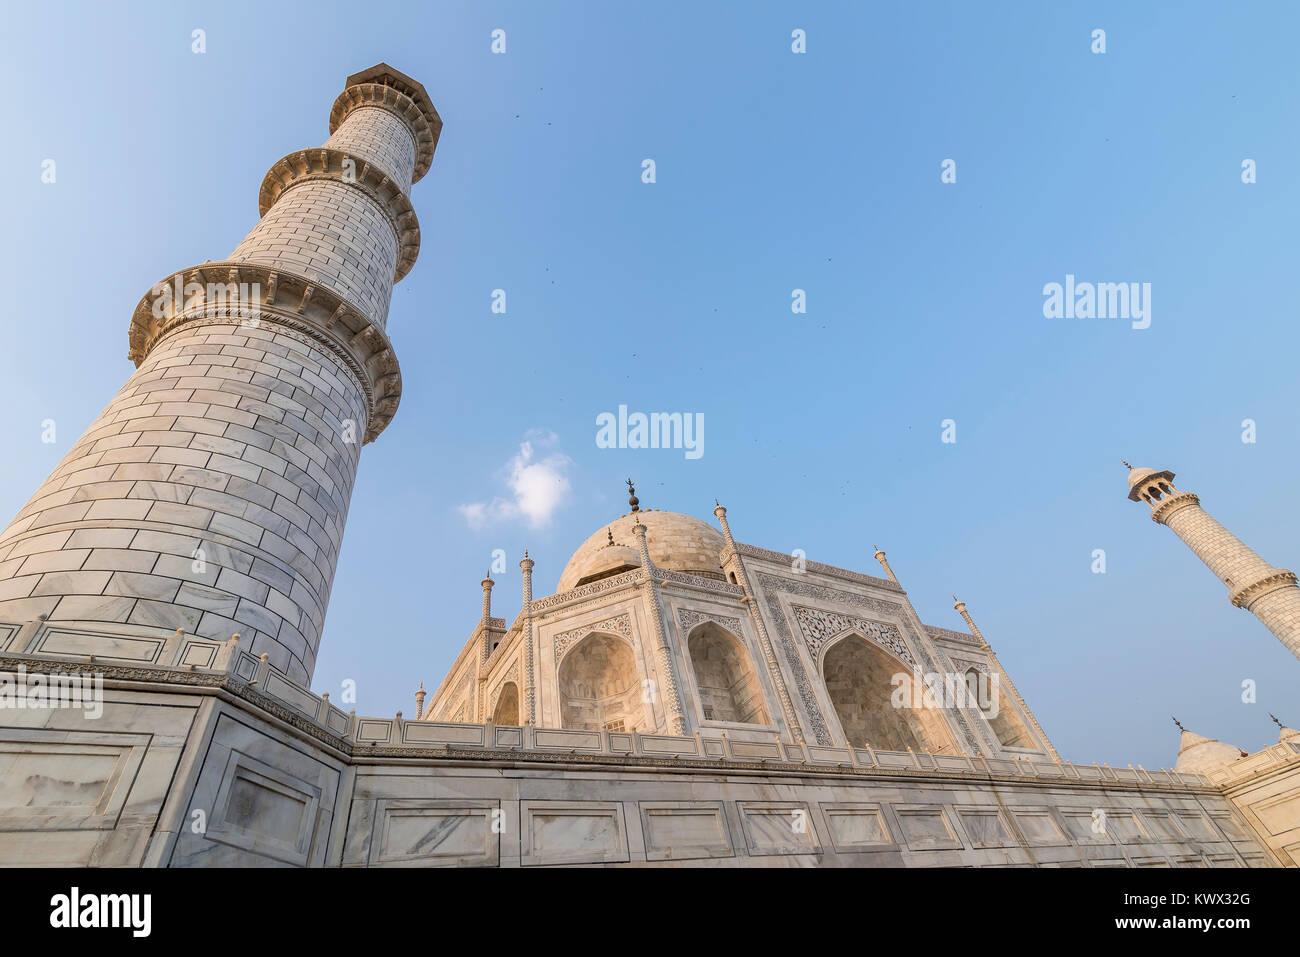 Wide angle view of Taj Mahal from below, Agra, Uttar Pradesh, India - Stock Image